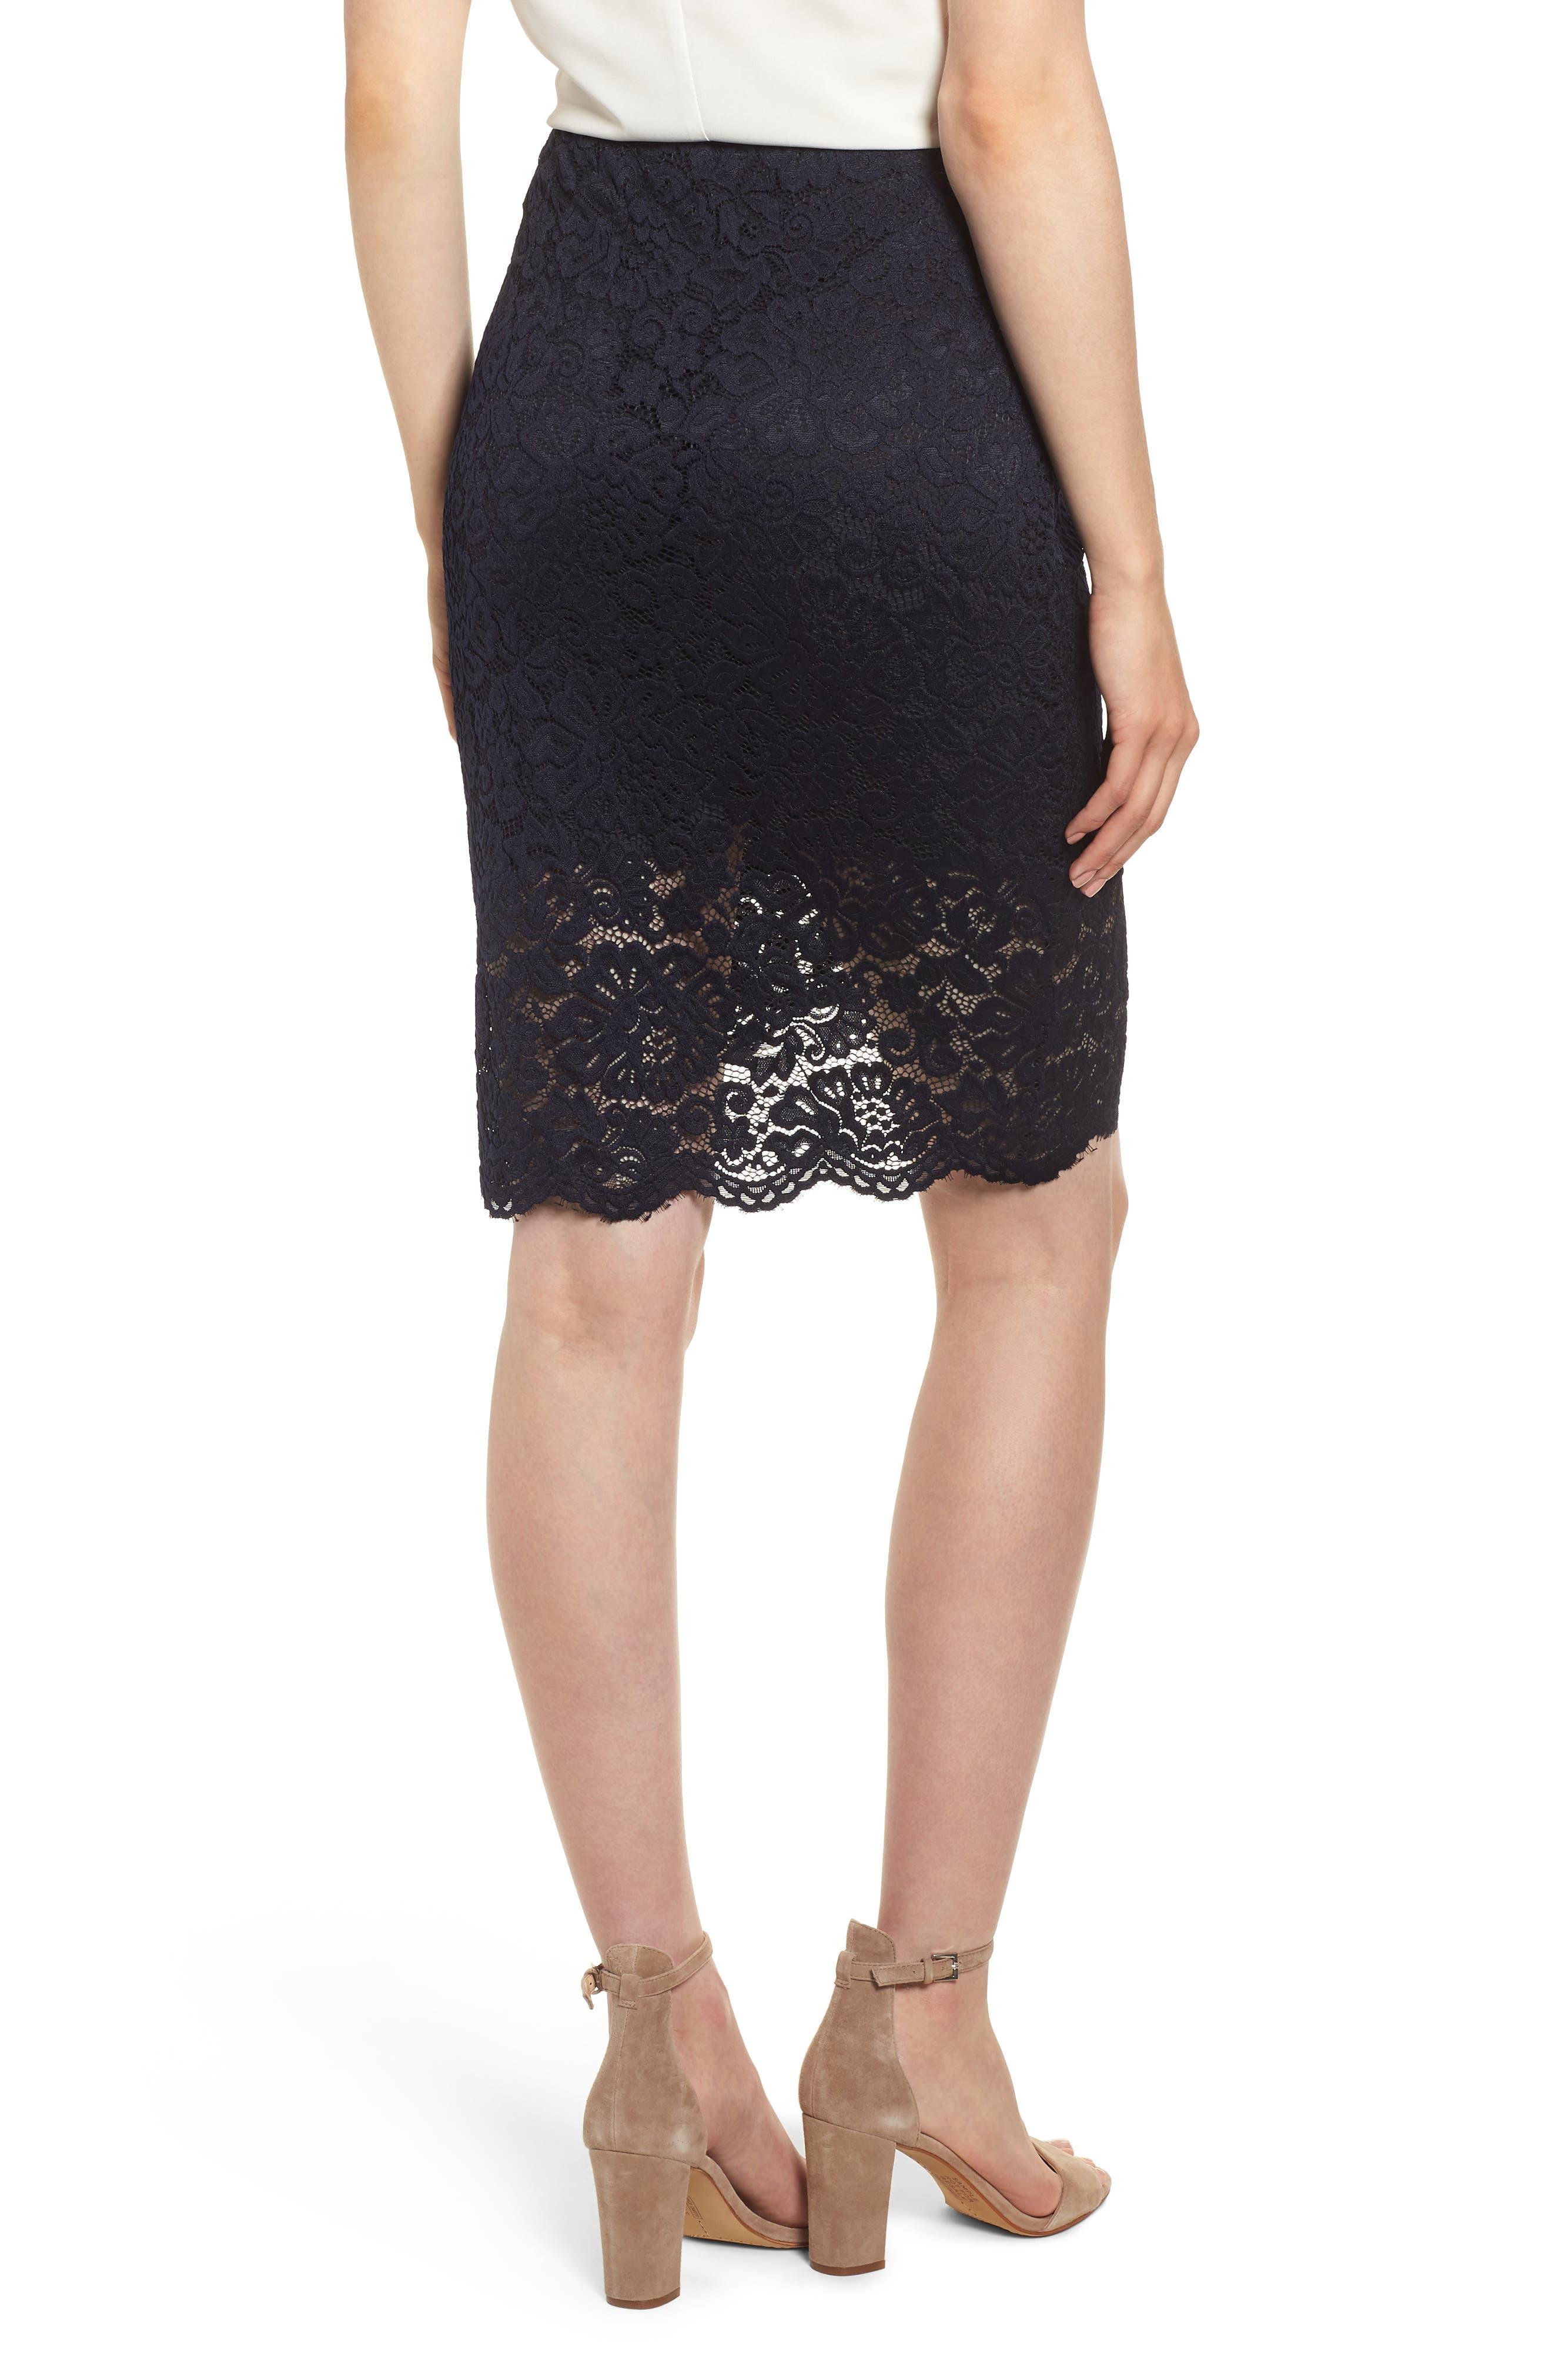 ROSEMUNDE, Lace Pencil Skirt, Alternate thumbnail 2, color, 001